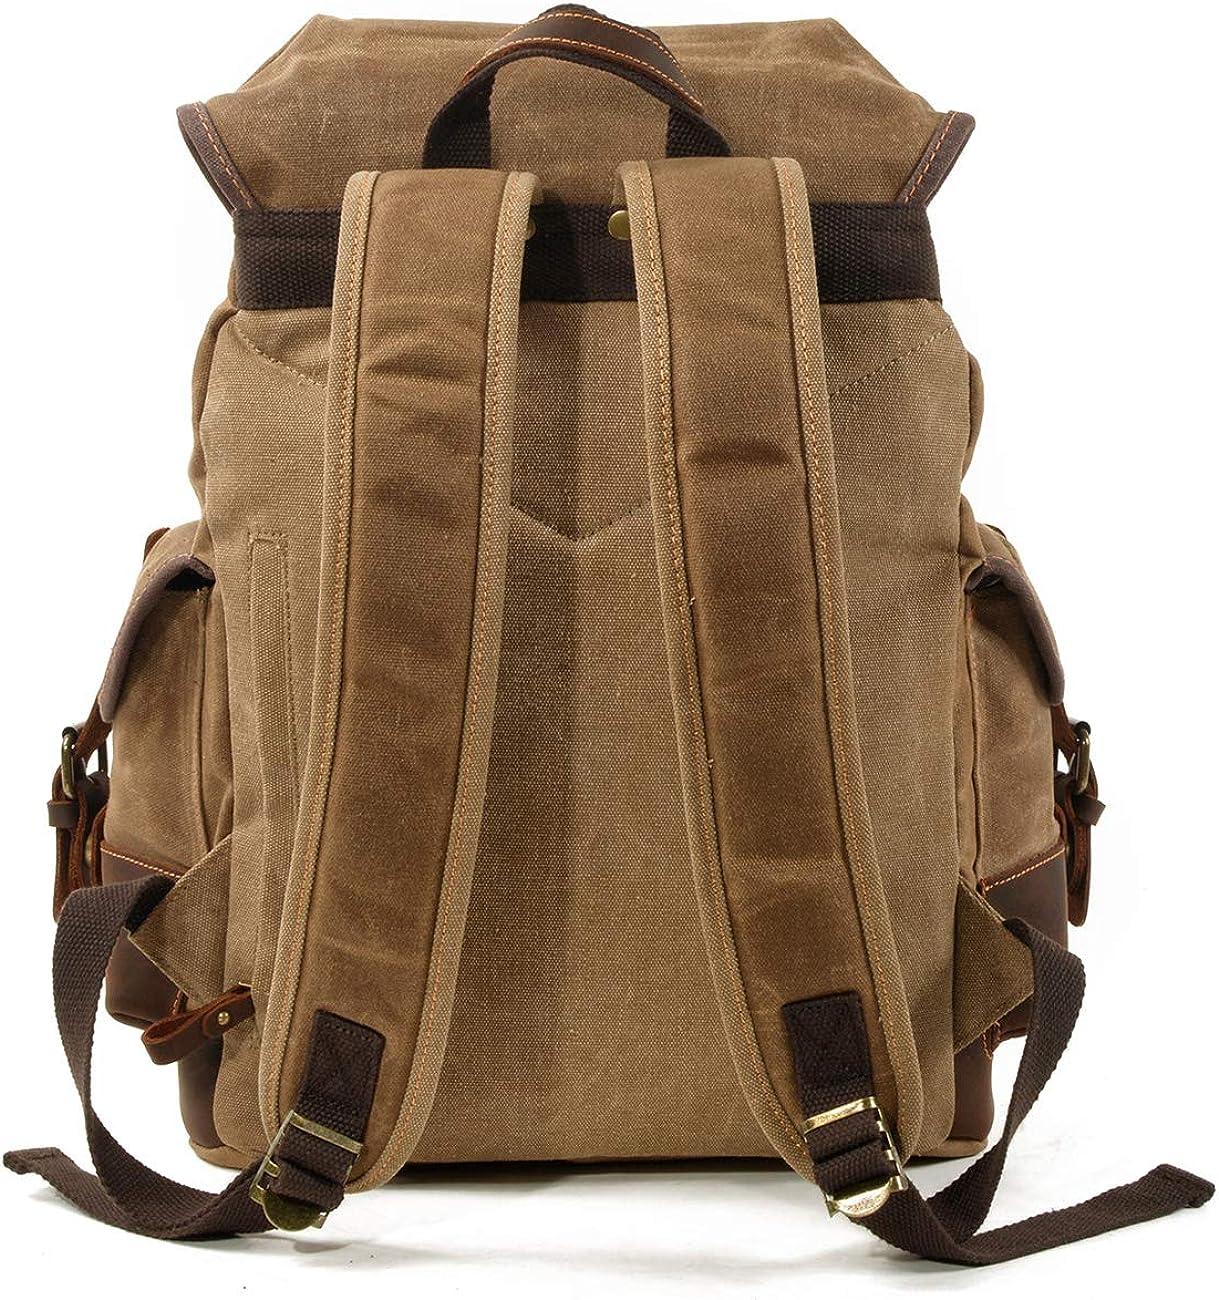 WUDON Men Travel Backpack Genuine Leather-Waxed Canvas Shoulder Hiking Rucksack